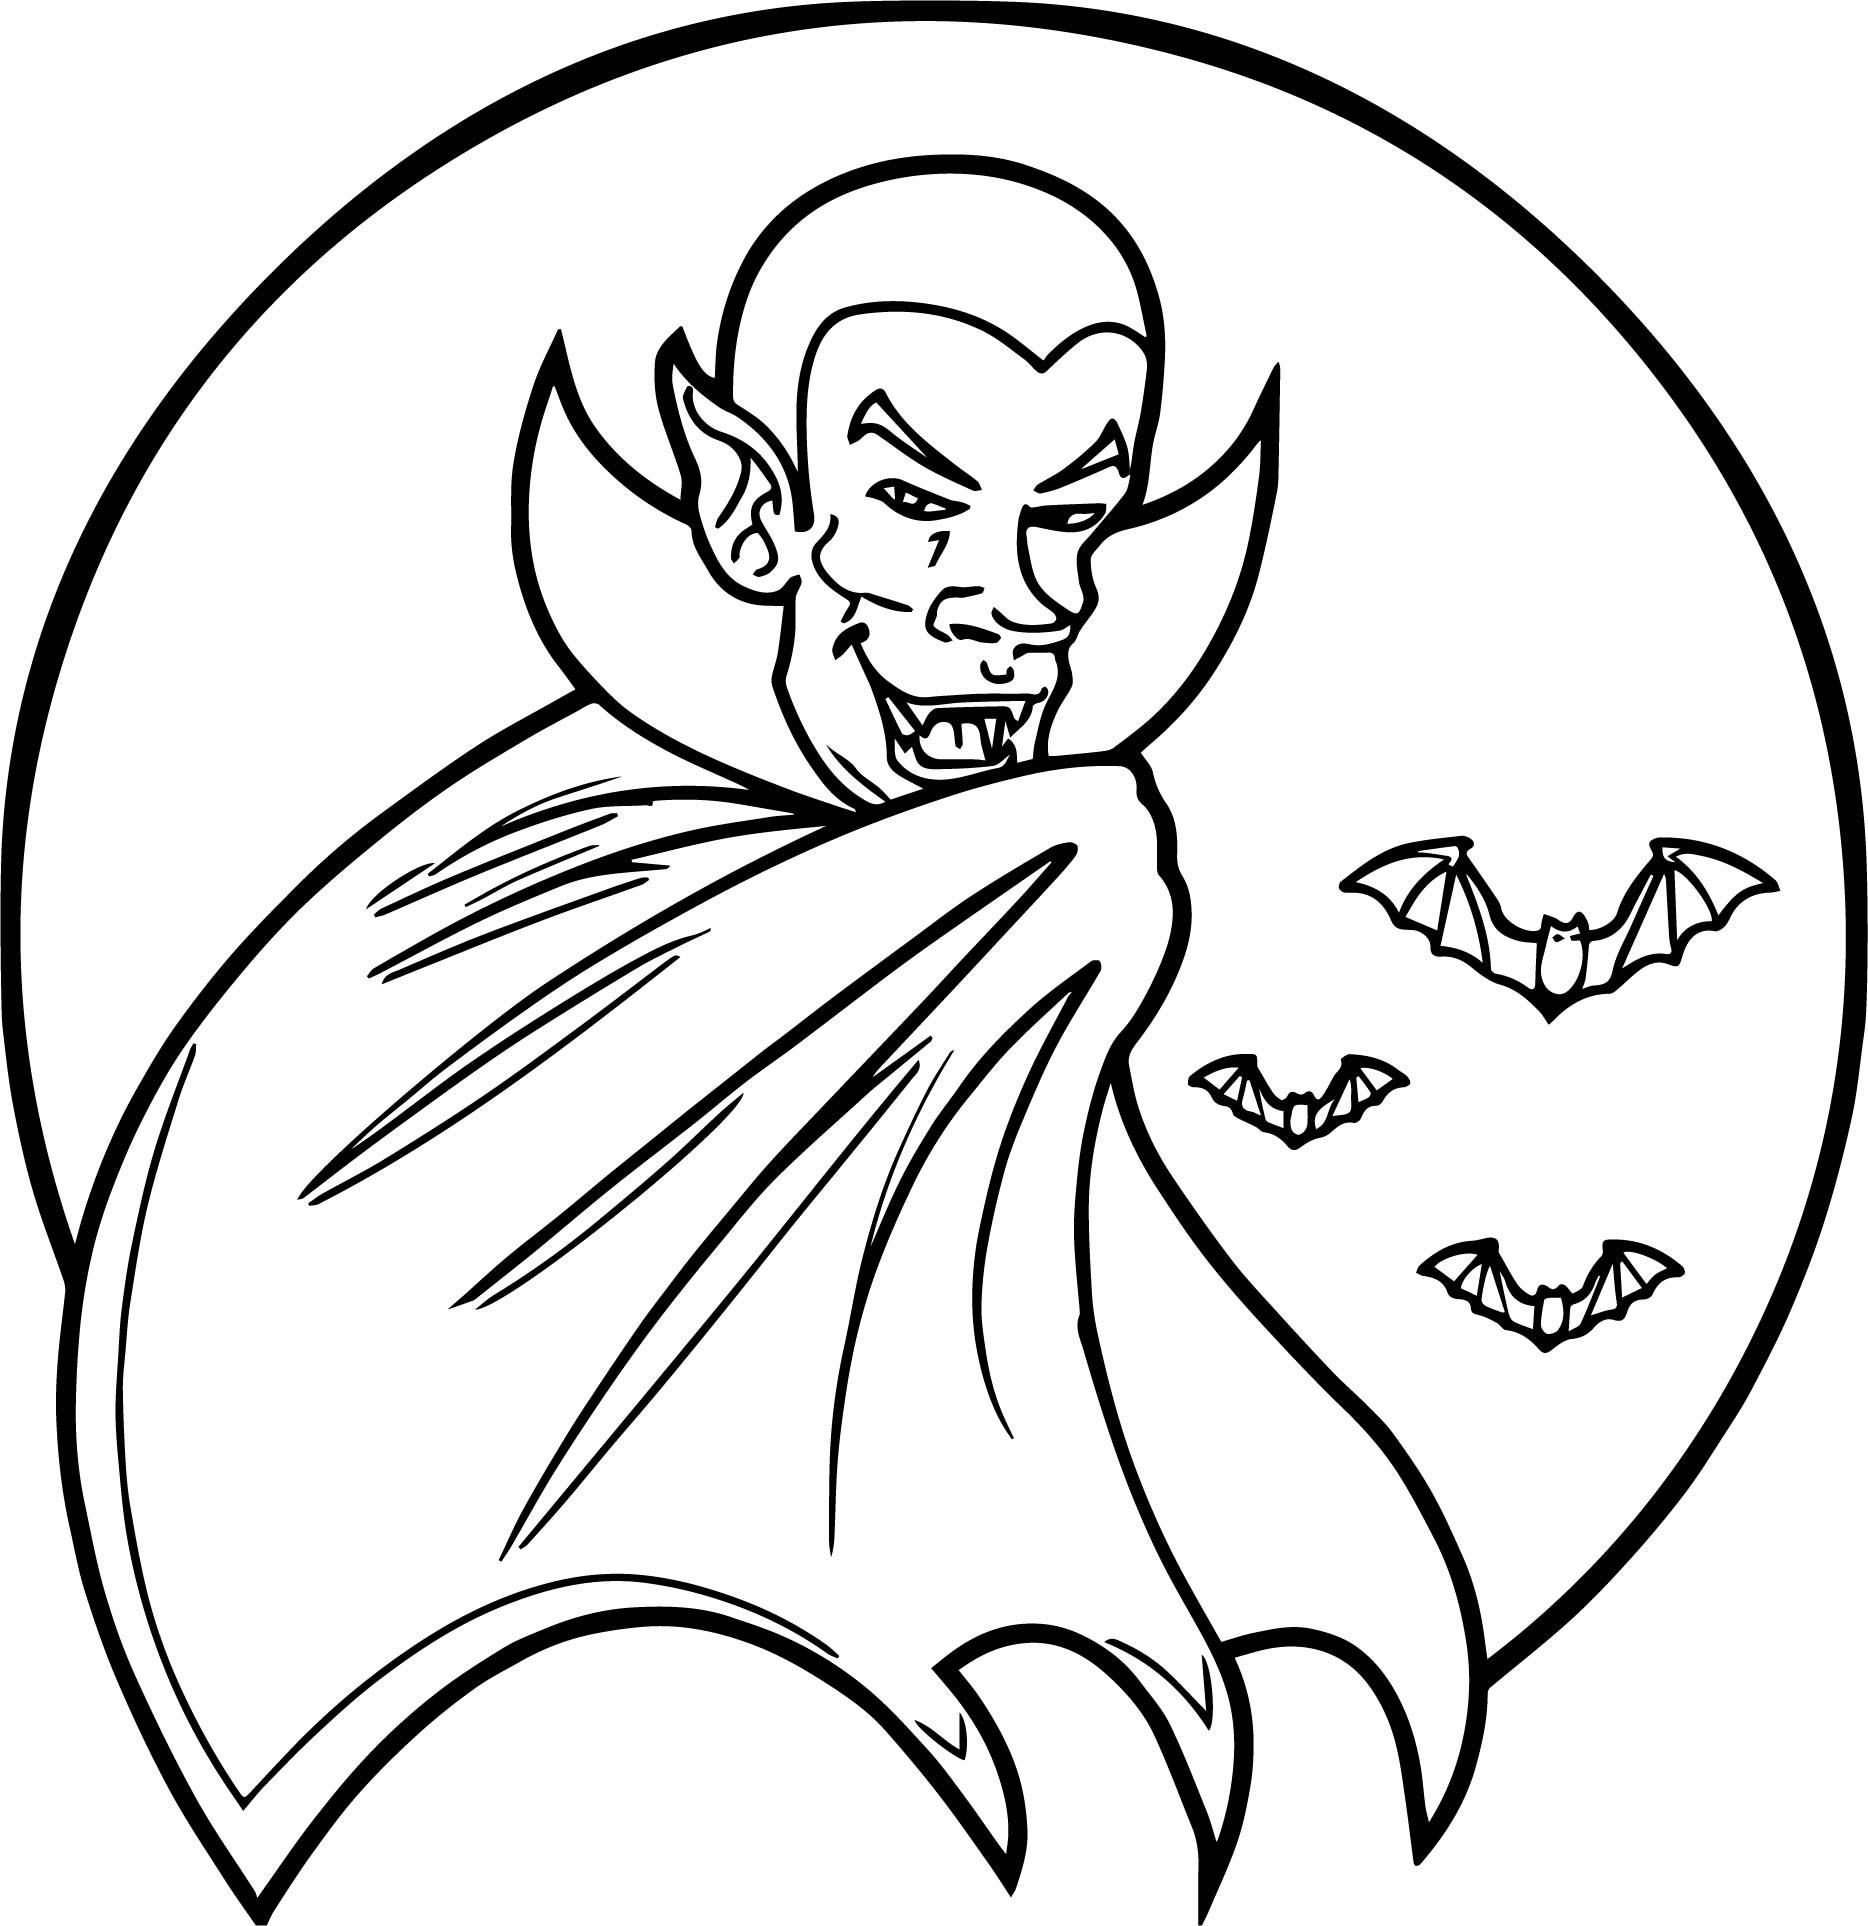 1868x1926 Coloring Page Of A Vampire Bat New Vampire Bat Coloring Page